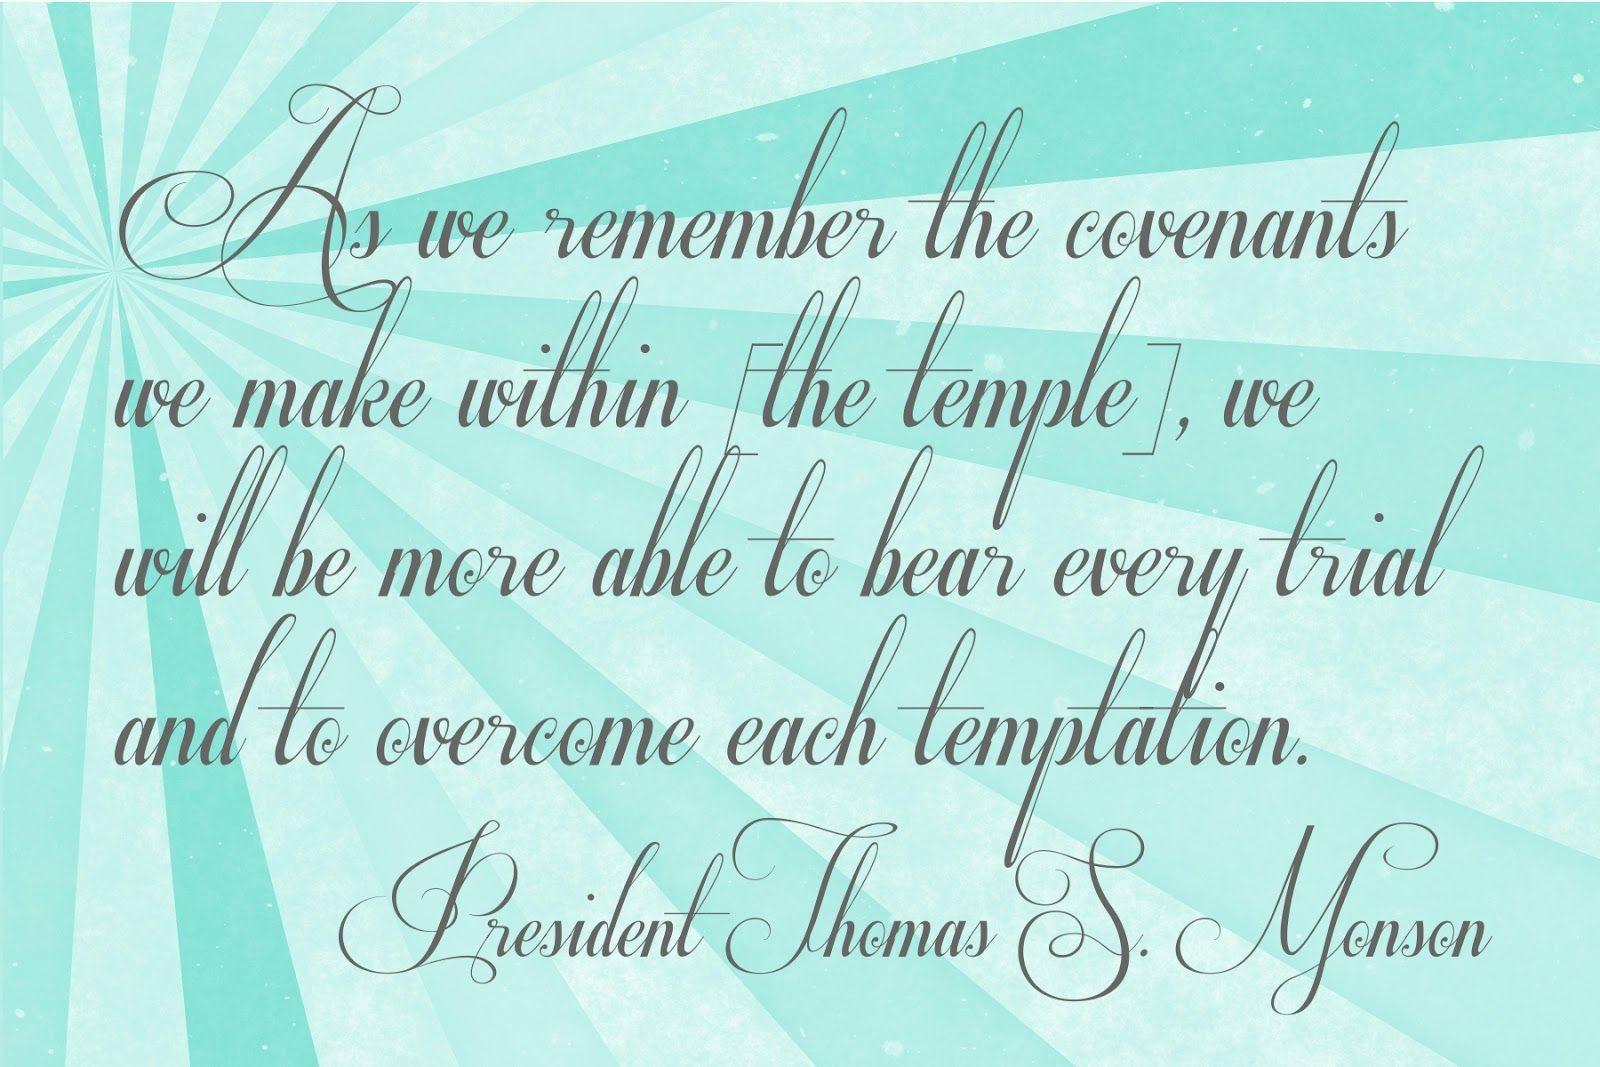 Temple Covenants help us overcome temptations~ President Thomas S. Monson